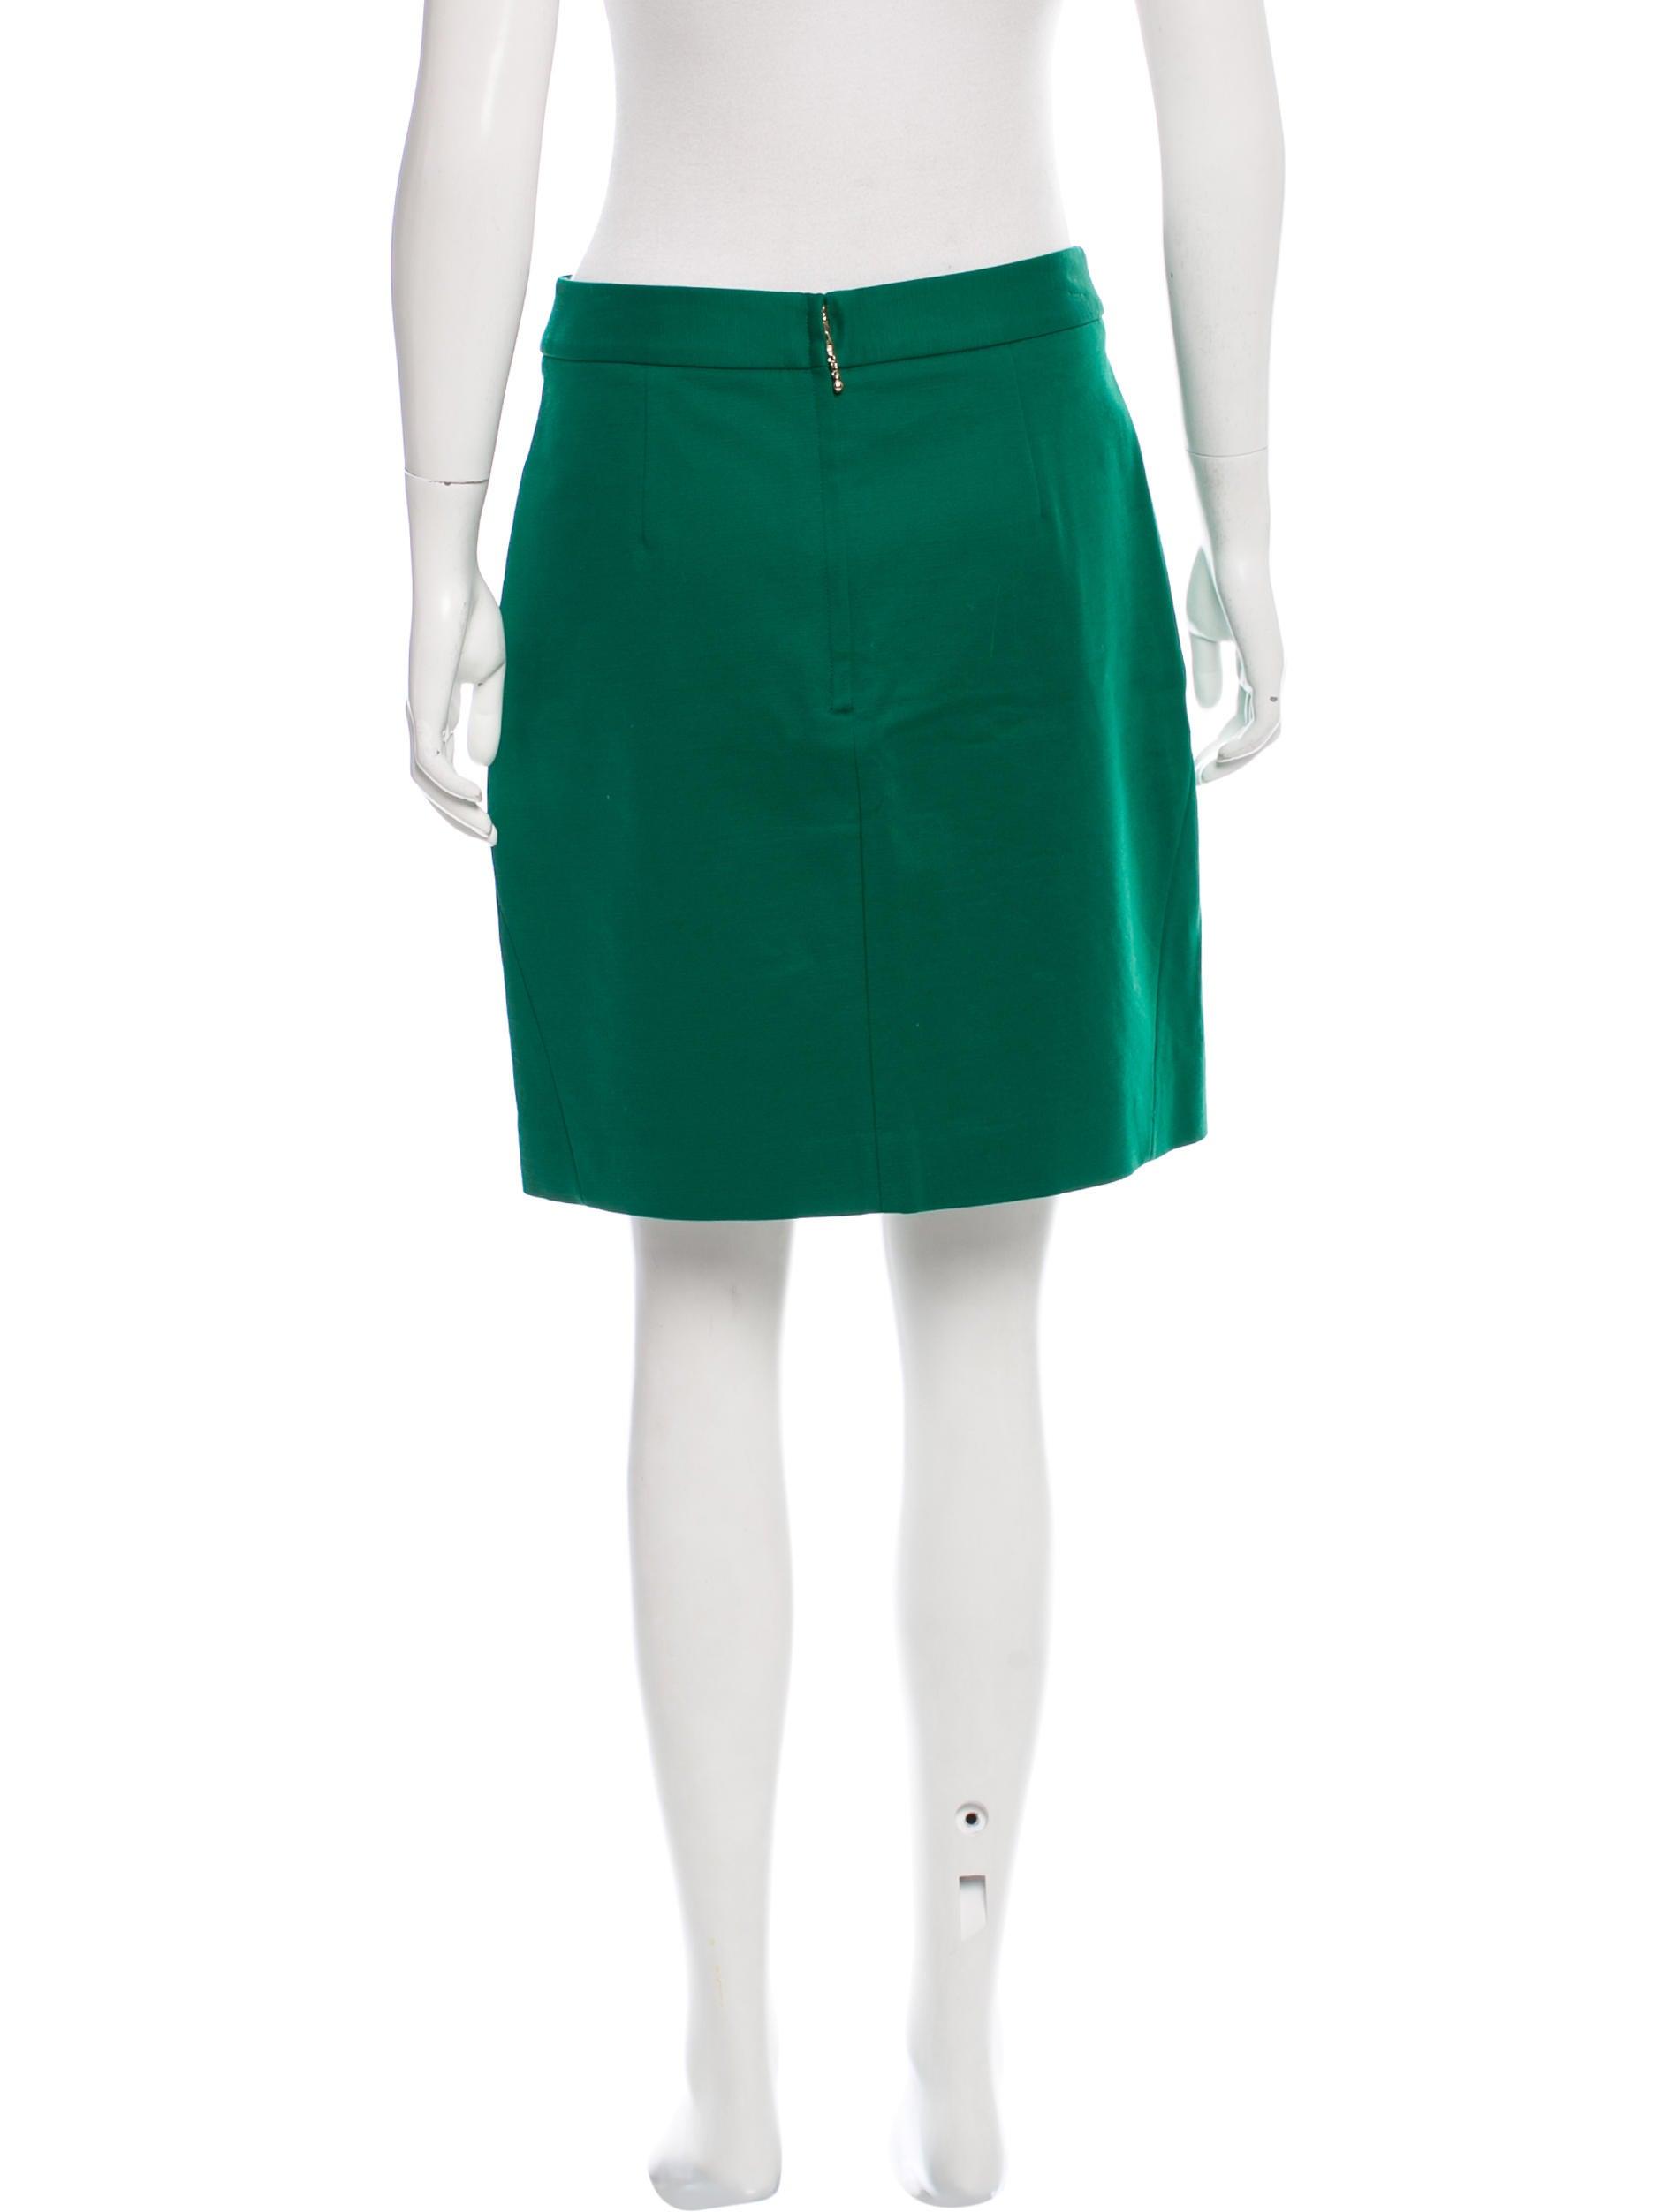 Kate Spade New York Mini Pencil Skirt Clothing